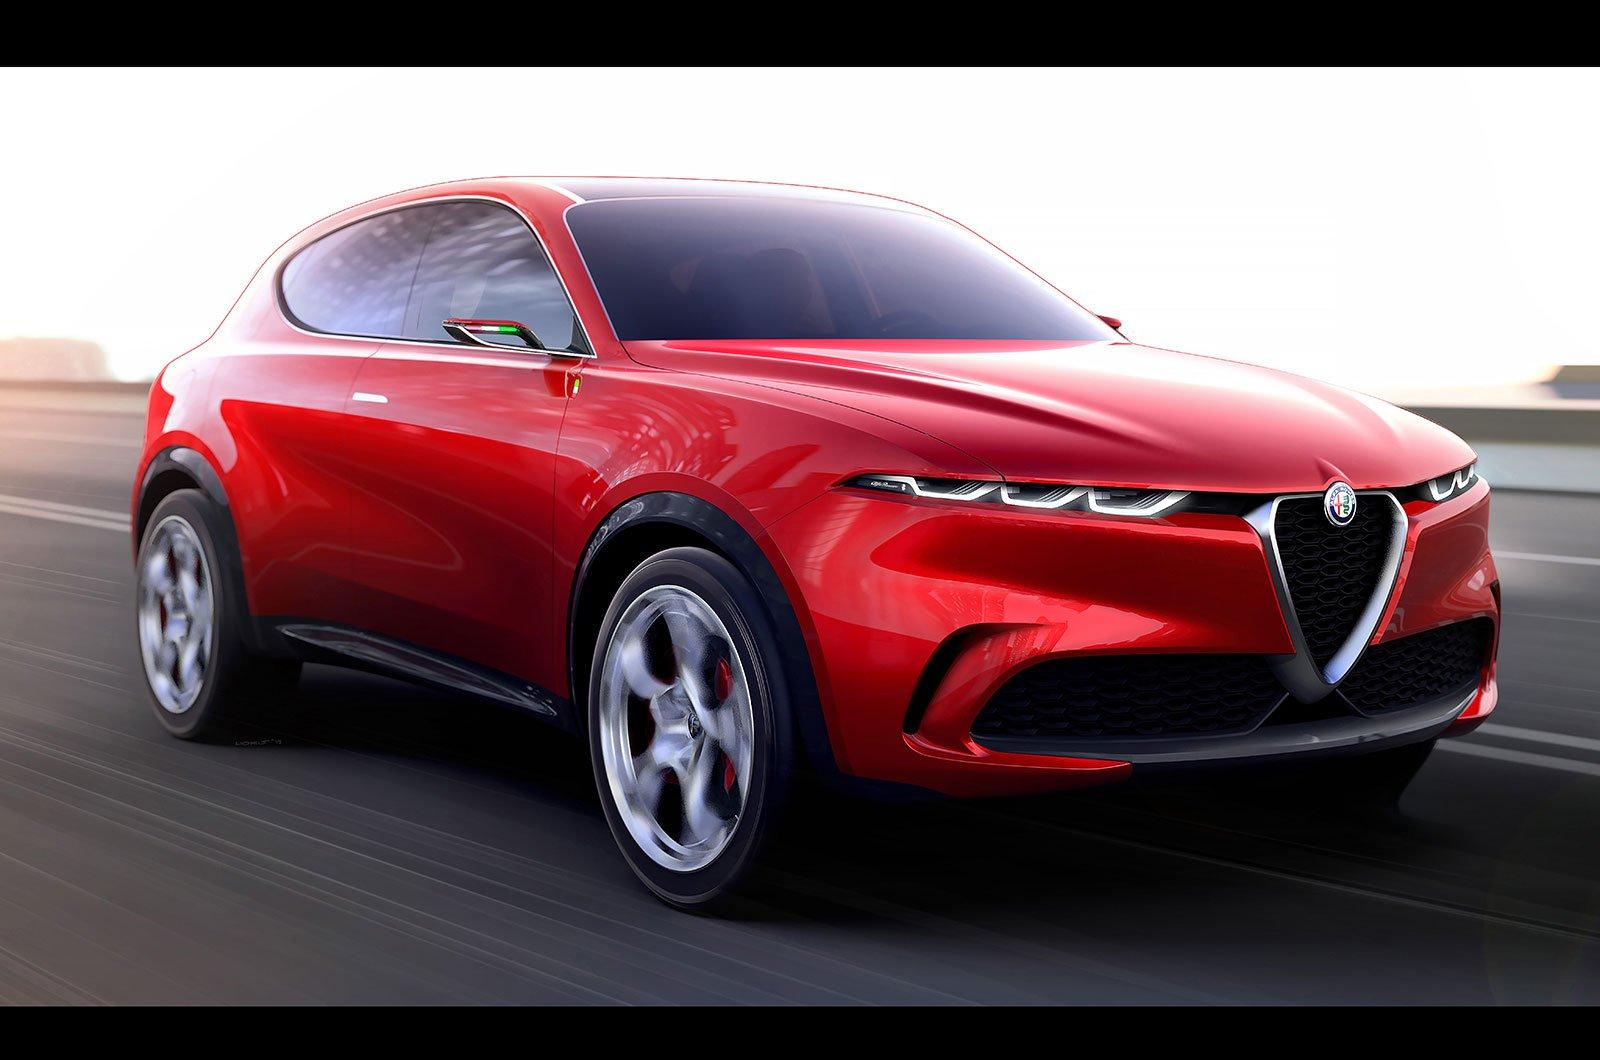 Alfa Romeo Tonale front